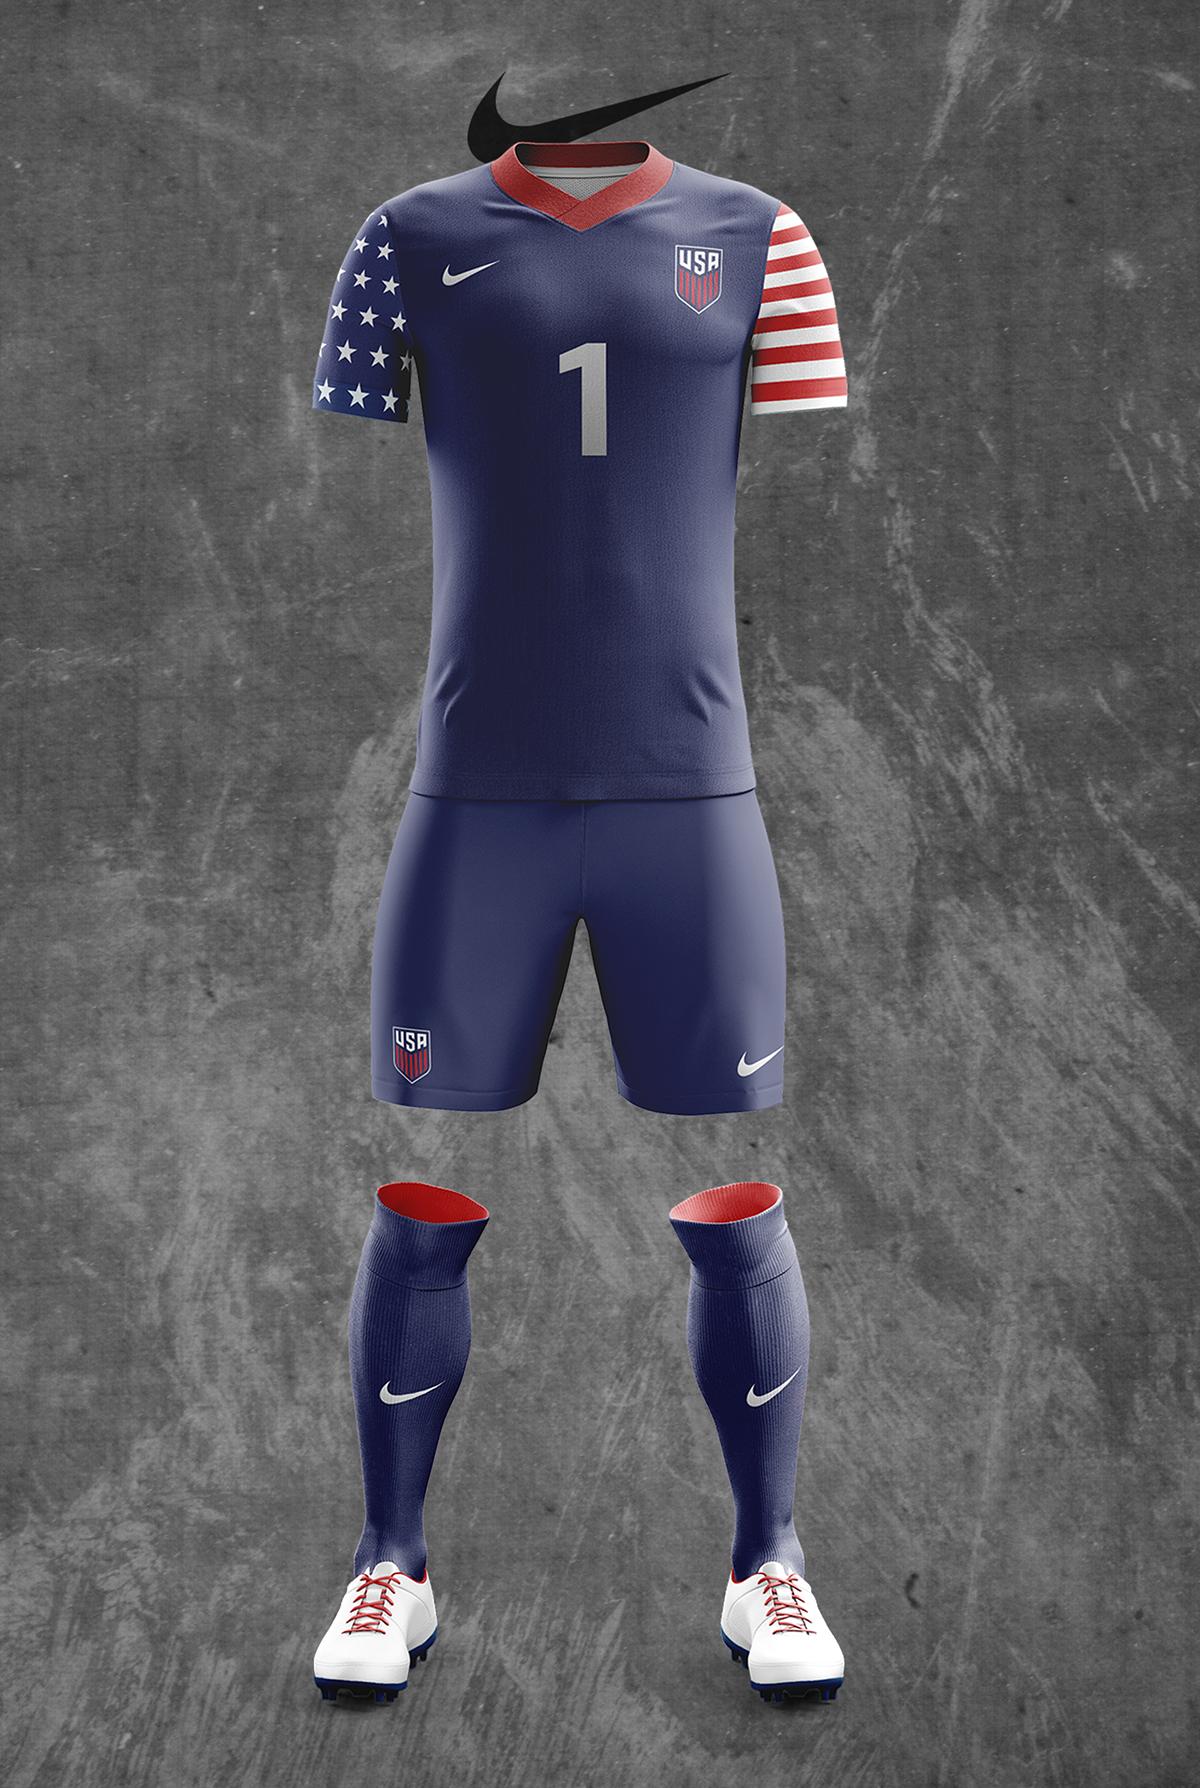 21f60d784f6 Concept US Men s National Team Nike Soccer Kit Designs on Pantone ...